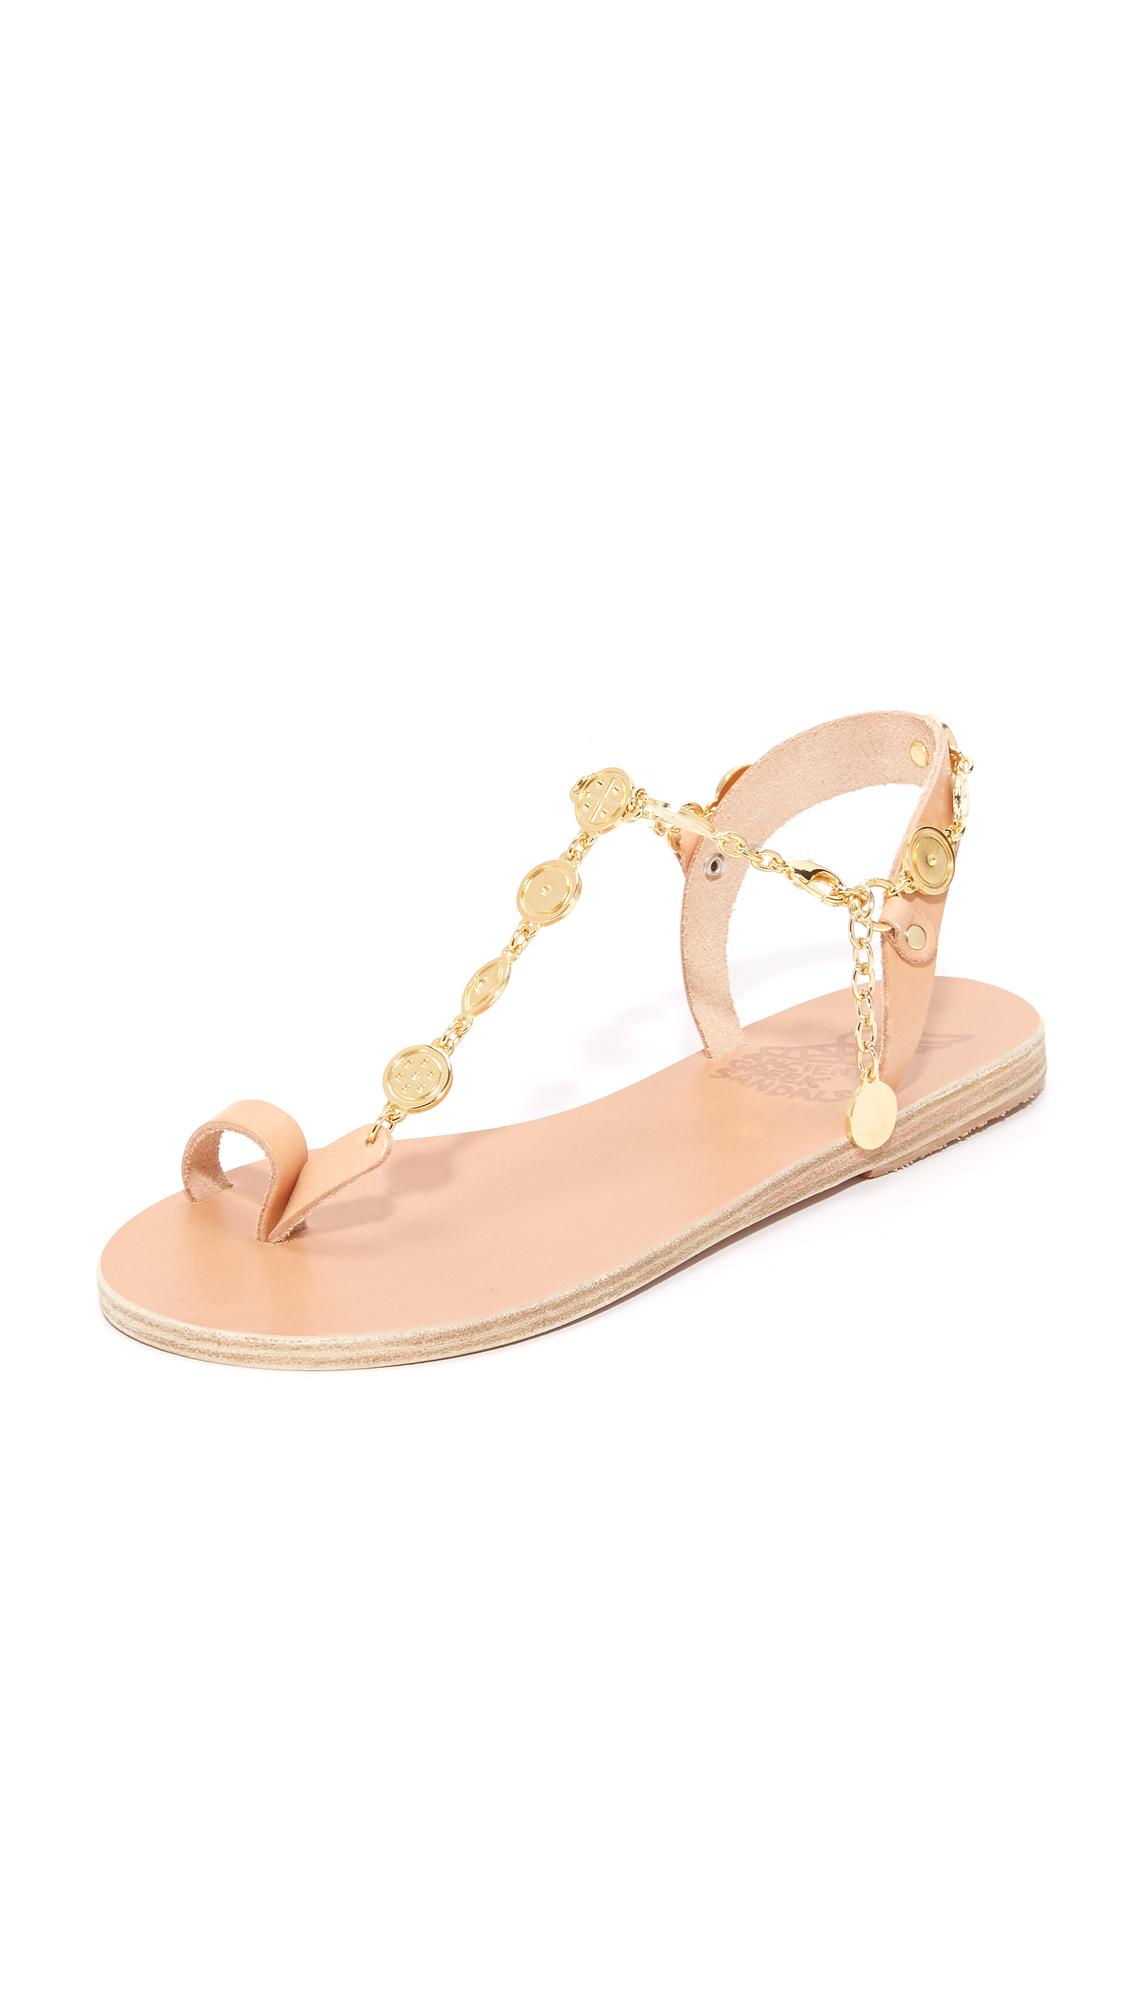 Ancient Greek Sandals Pandora Toe Ring Sandals - Natural at Shopbop